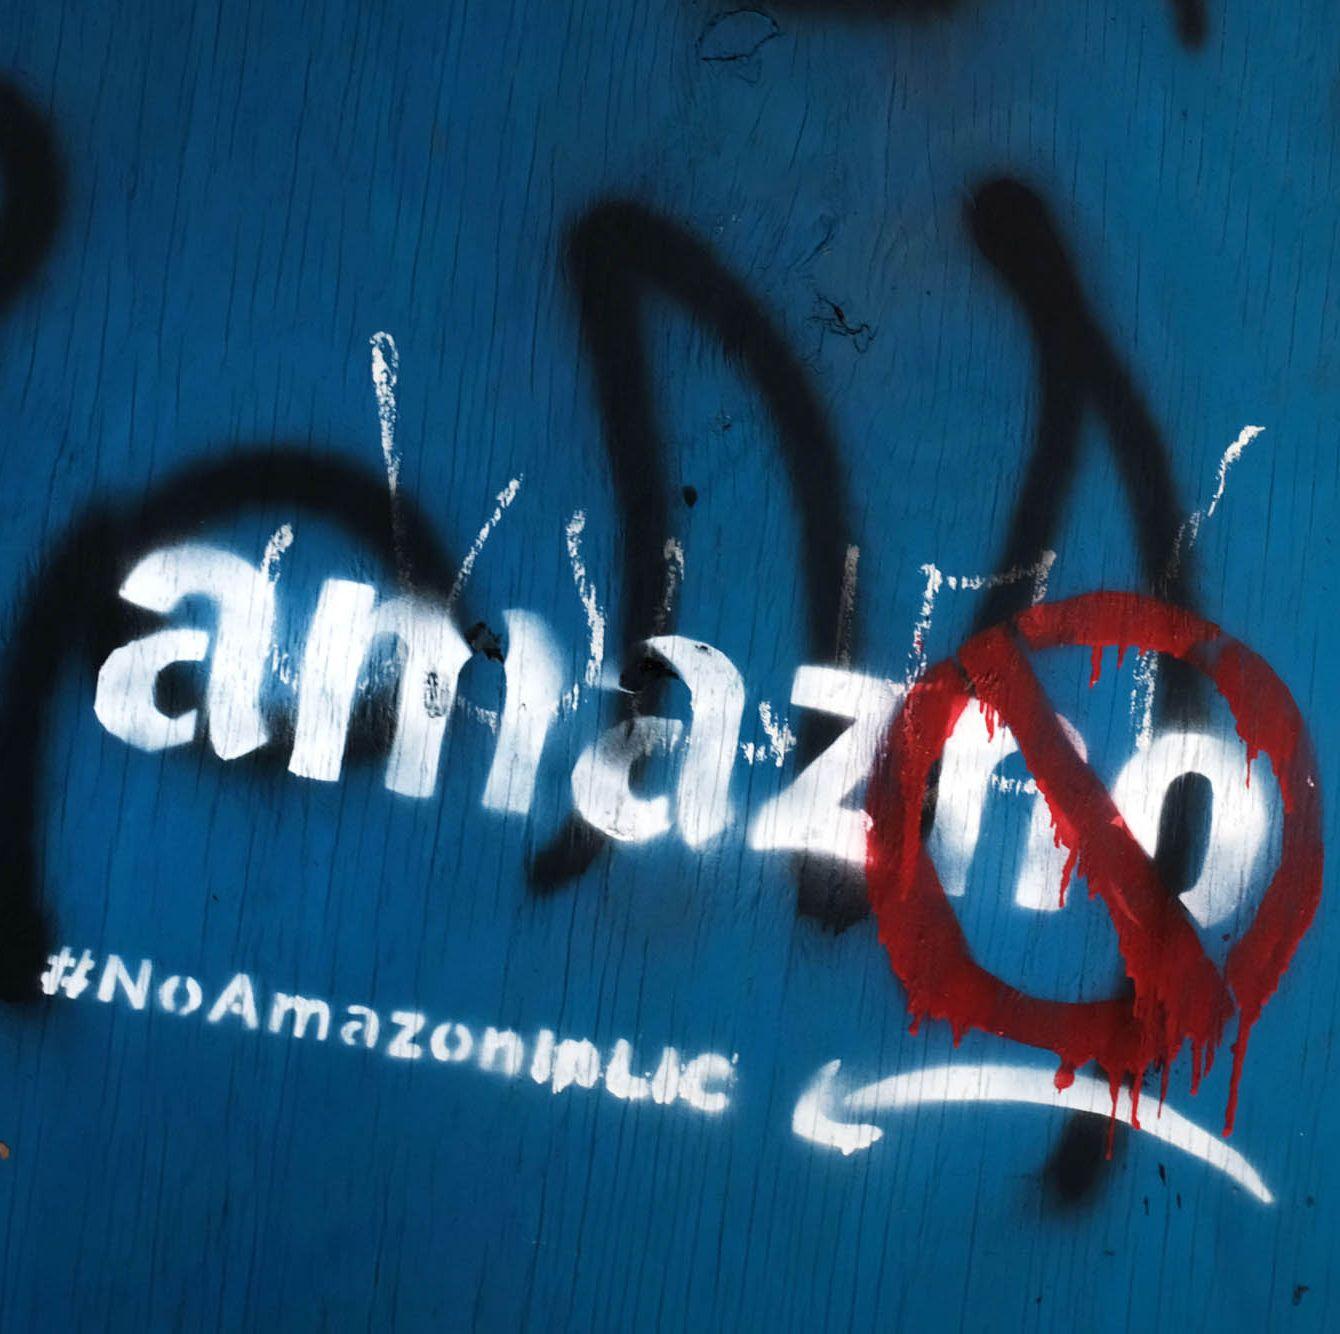 Amazon's New York City Saga Ultimately Screwed Everyone